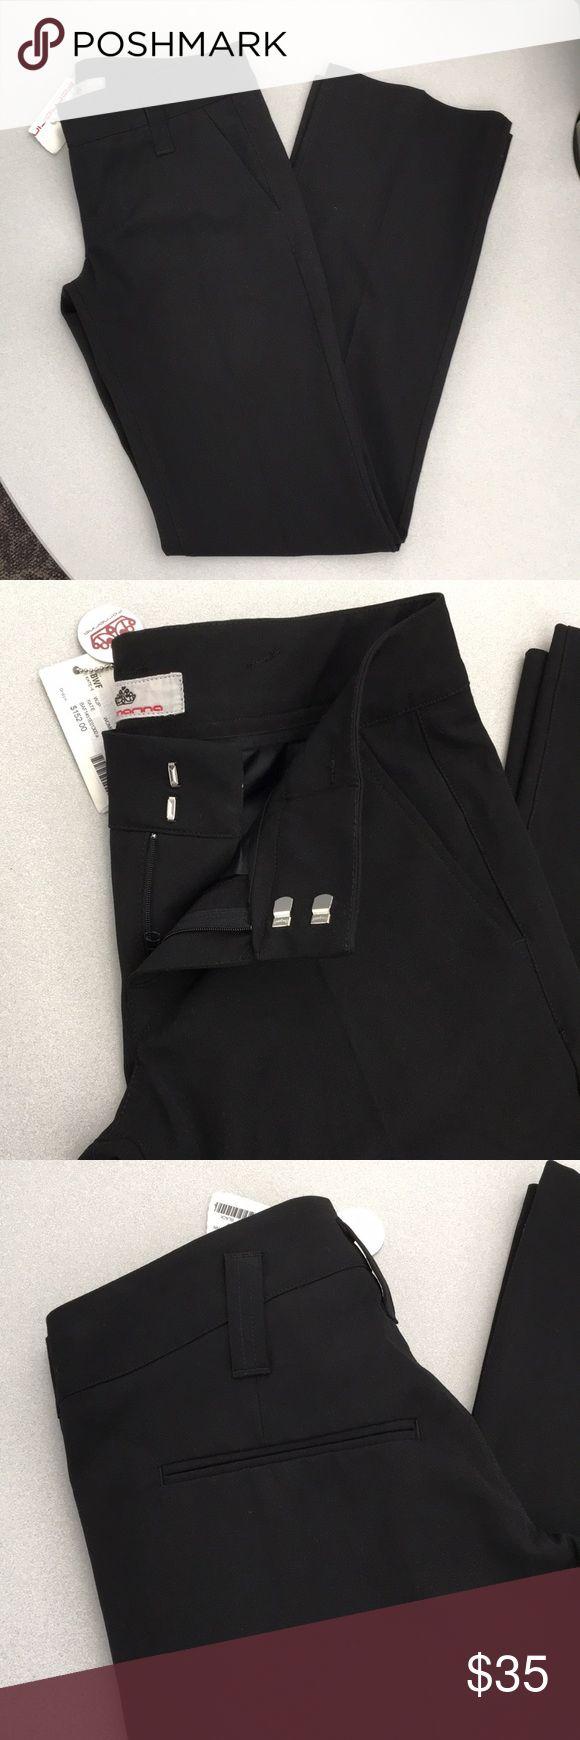 Women's dress pants Black, dressy women's pants 68% Polyester 3% Elasthan (same as spandex or Lycra) 29% Viscose (is a type of rayon) Fornarina Women Pants